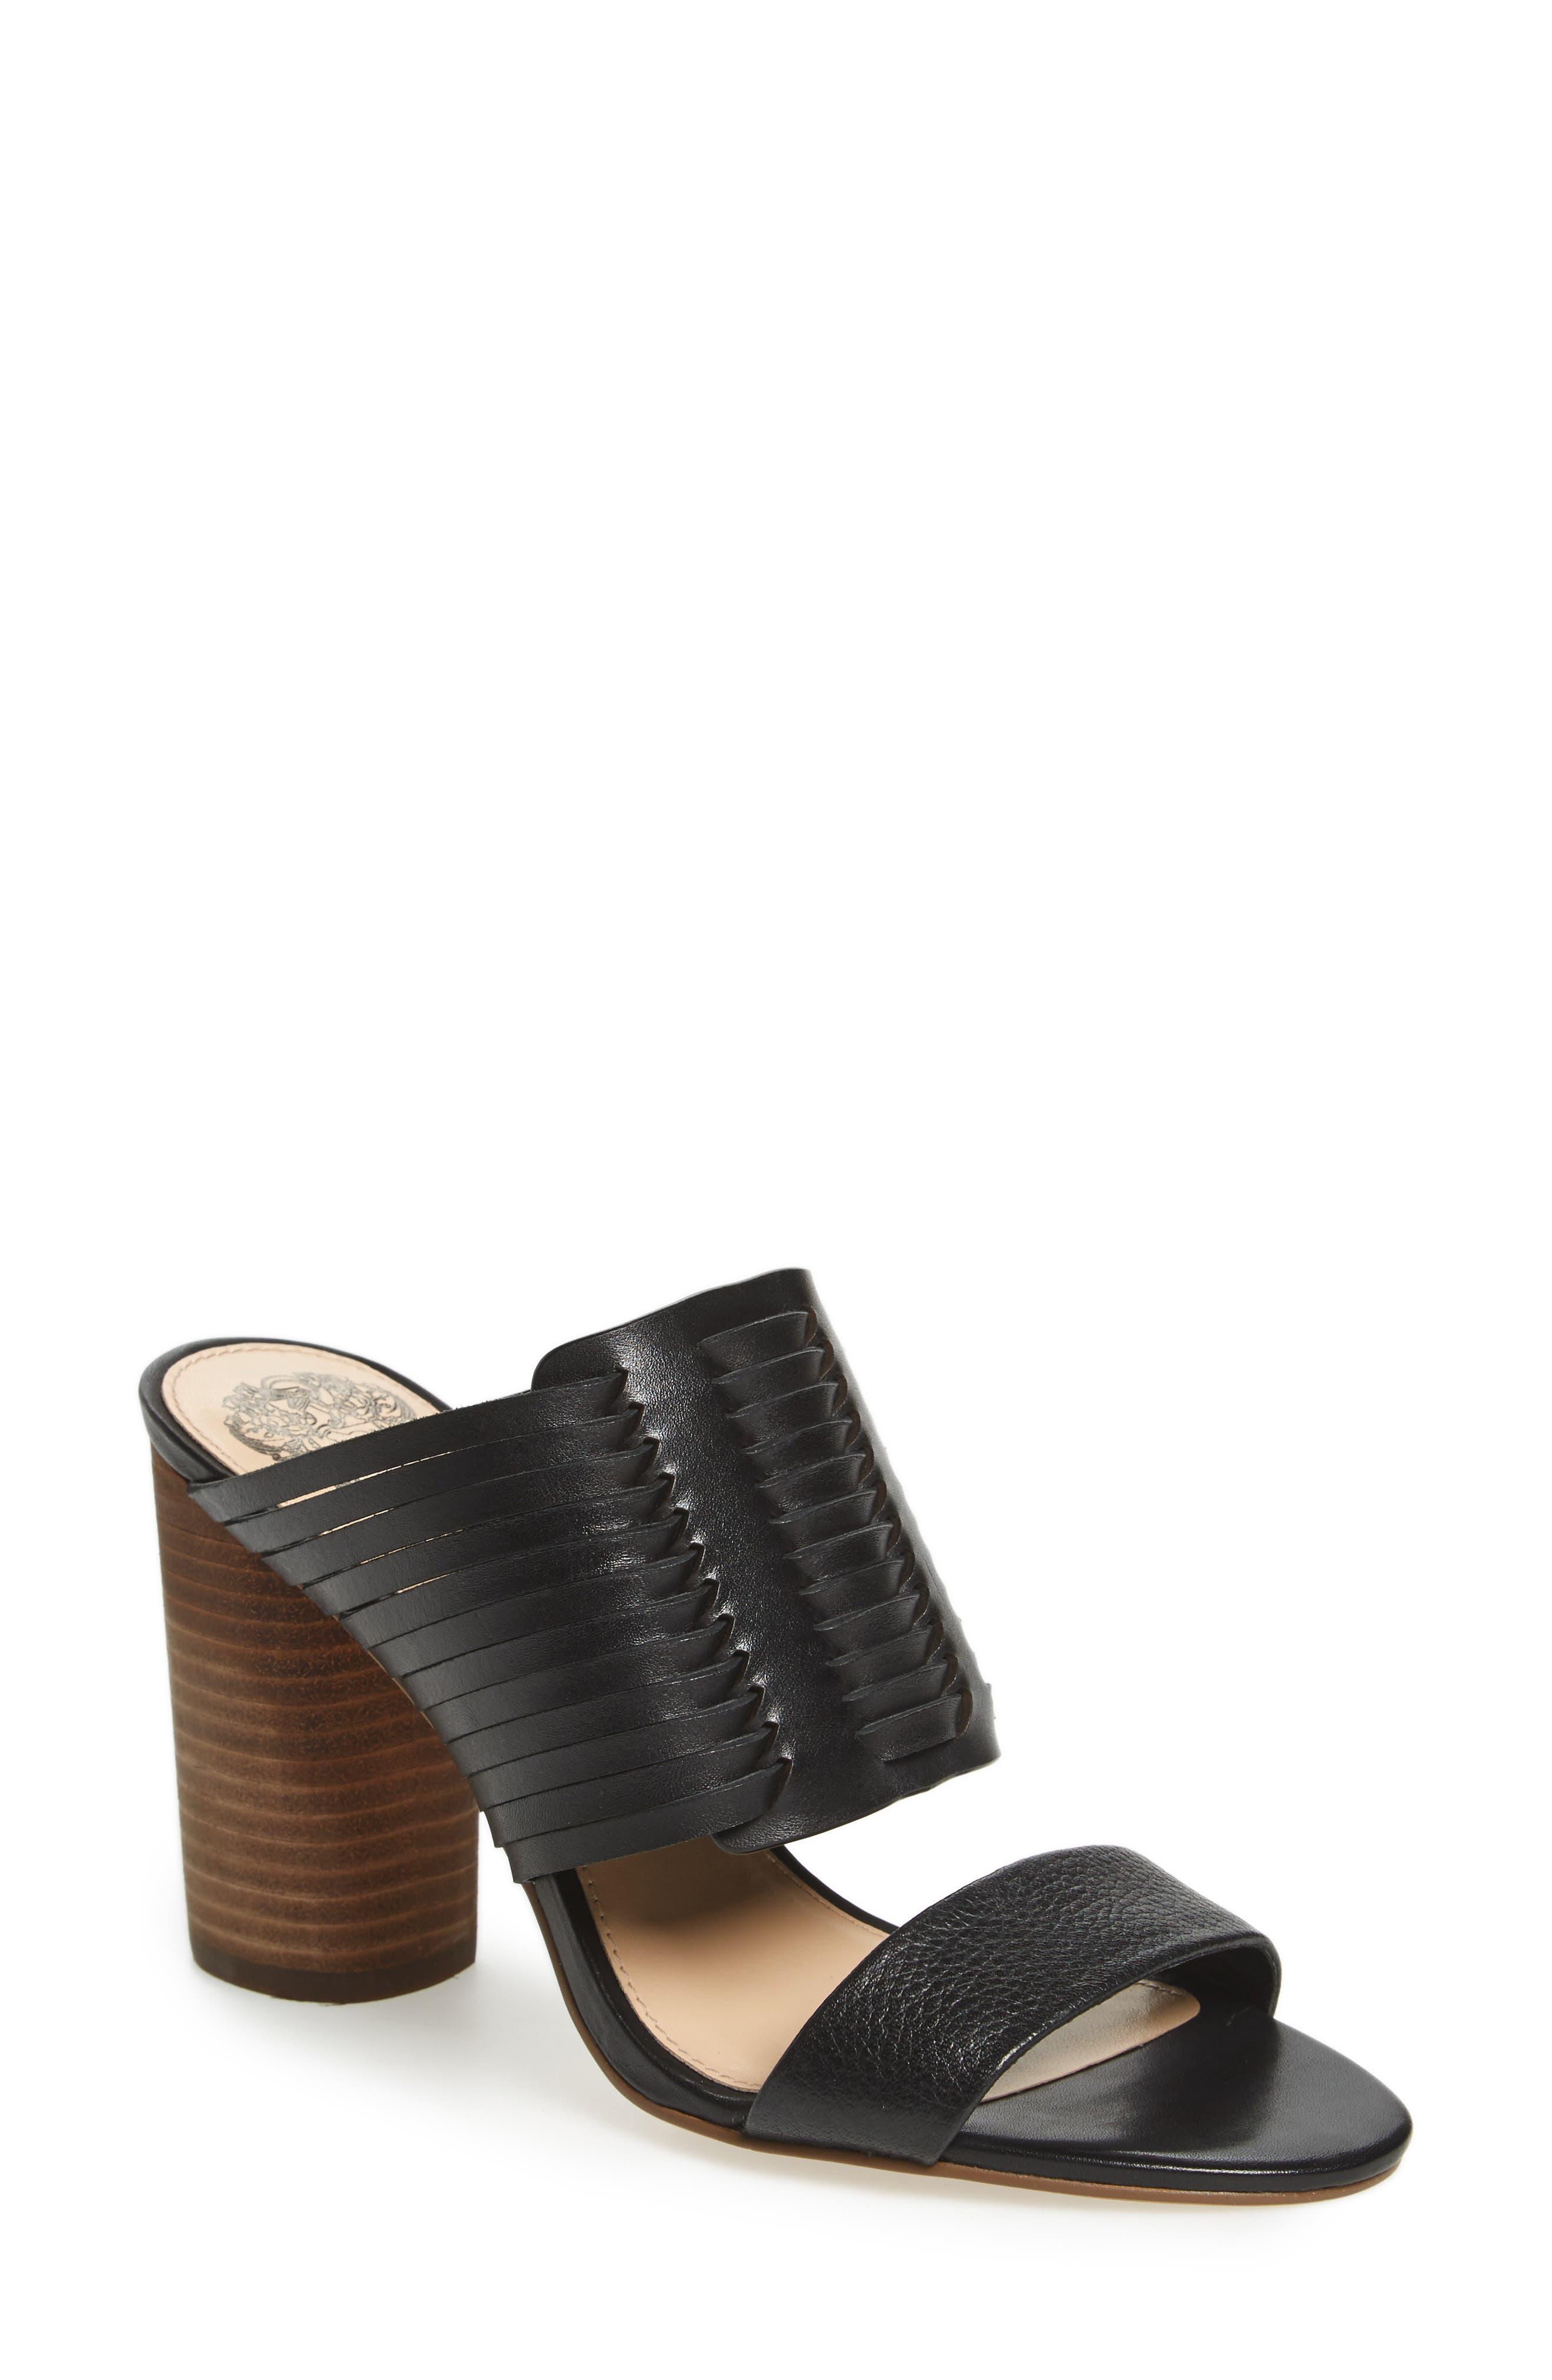 Main Image - Vince Camuto Astar Backless Sandal (Women)